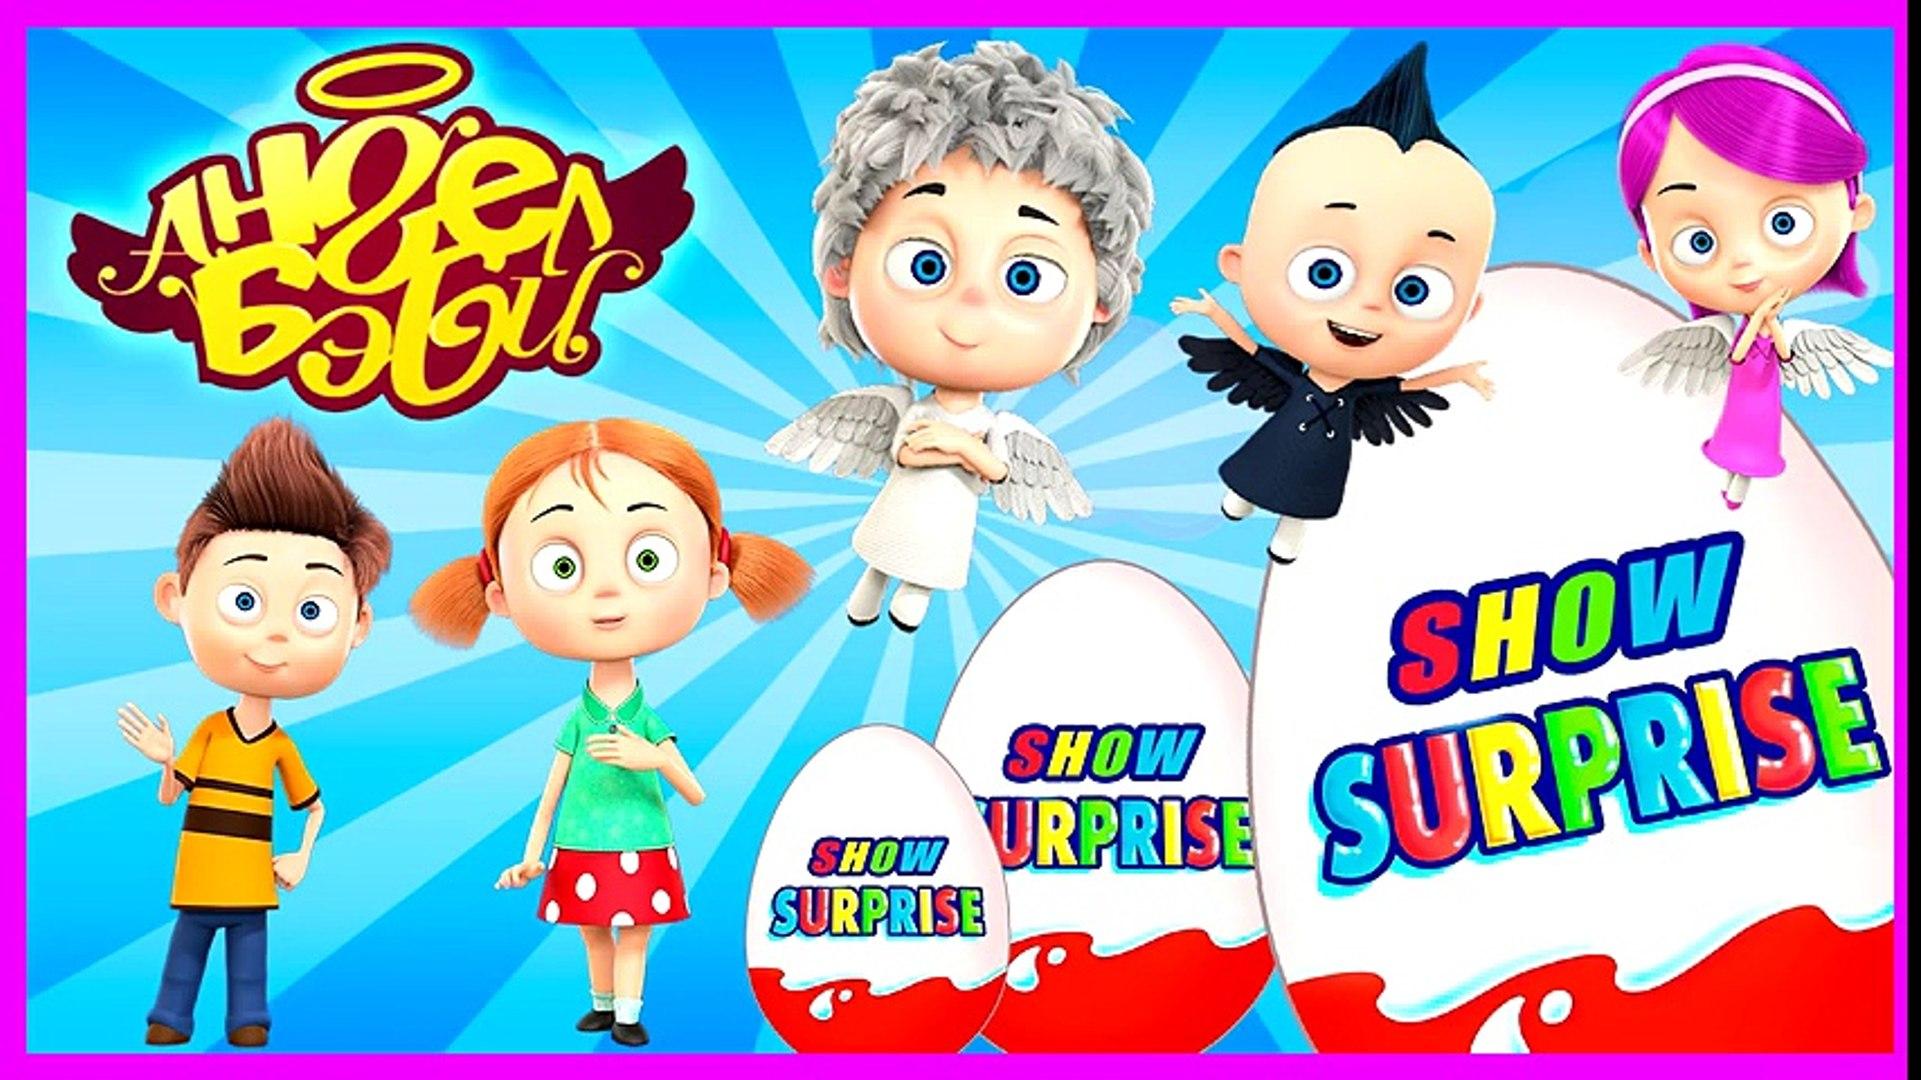 Best Surprise Show!!! Kinder Surprise - Angel Baby. Ангелы Бэби - новый мультик Киндер сюрприз!!!